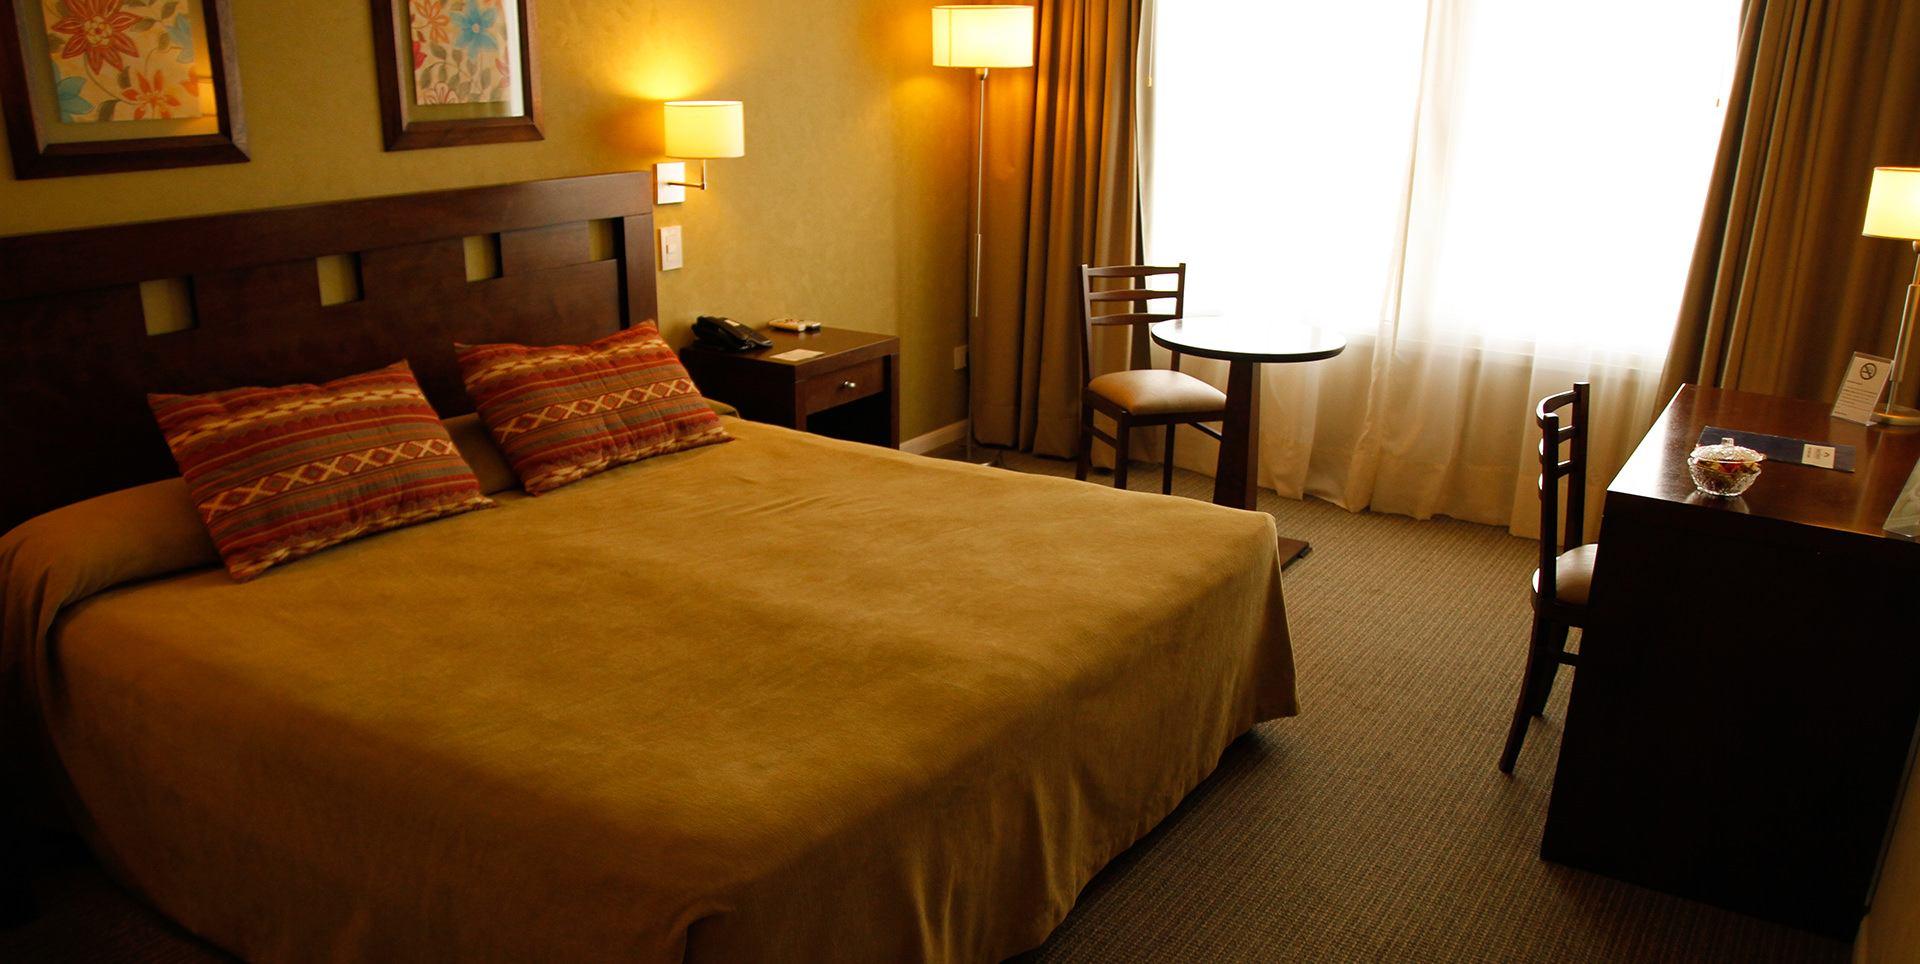 Habitacion King Hotel Howard Jhonson Trenque Lauquen